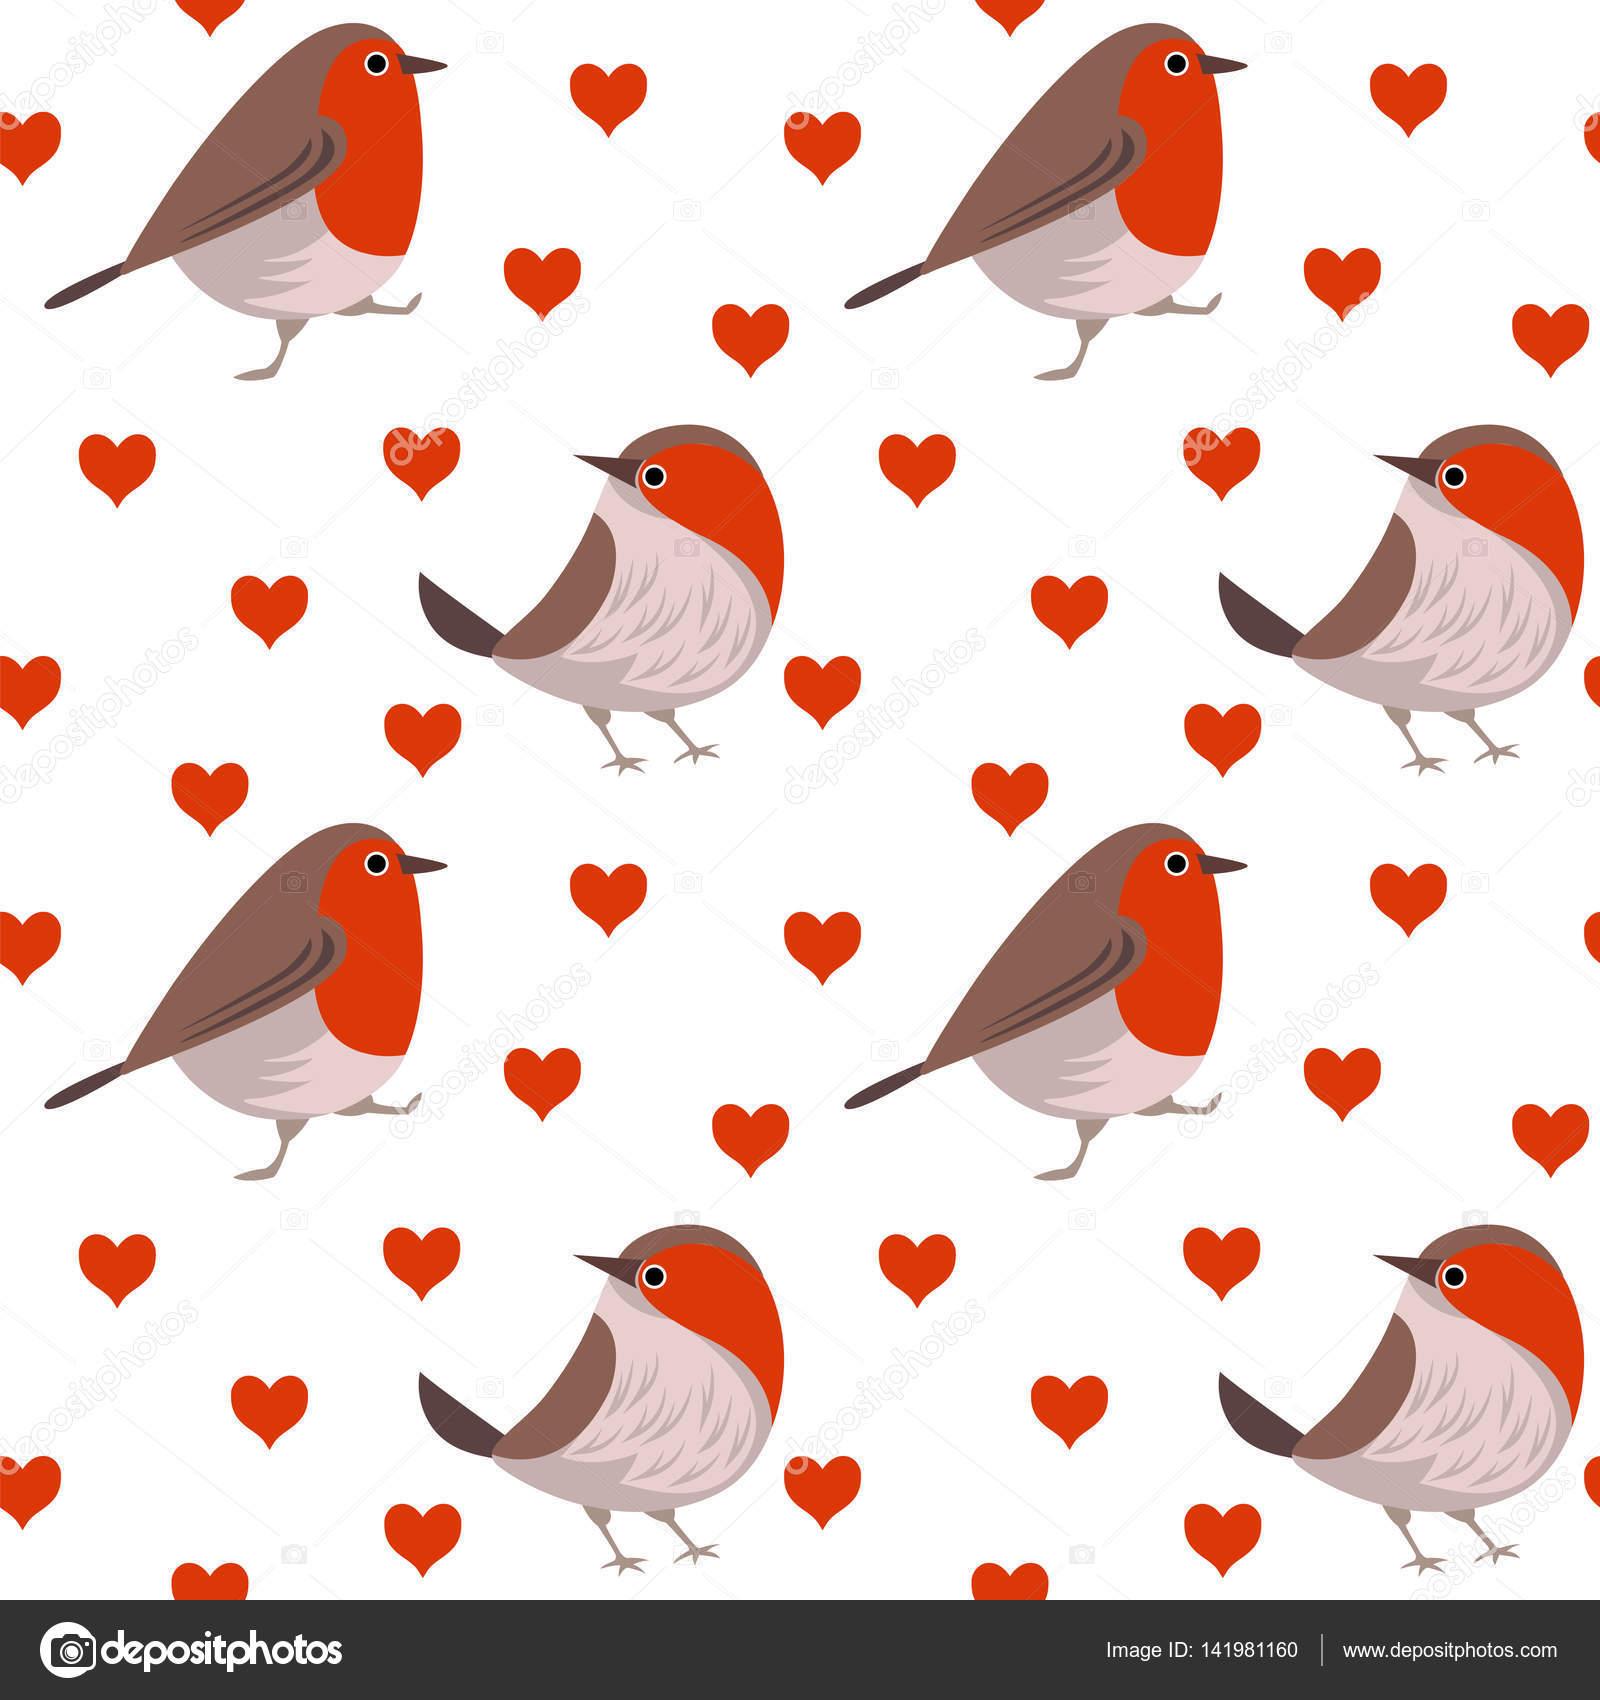 Lustige Muster Mit Vogel Stockvektor C Qwerty1204 141981160